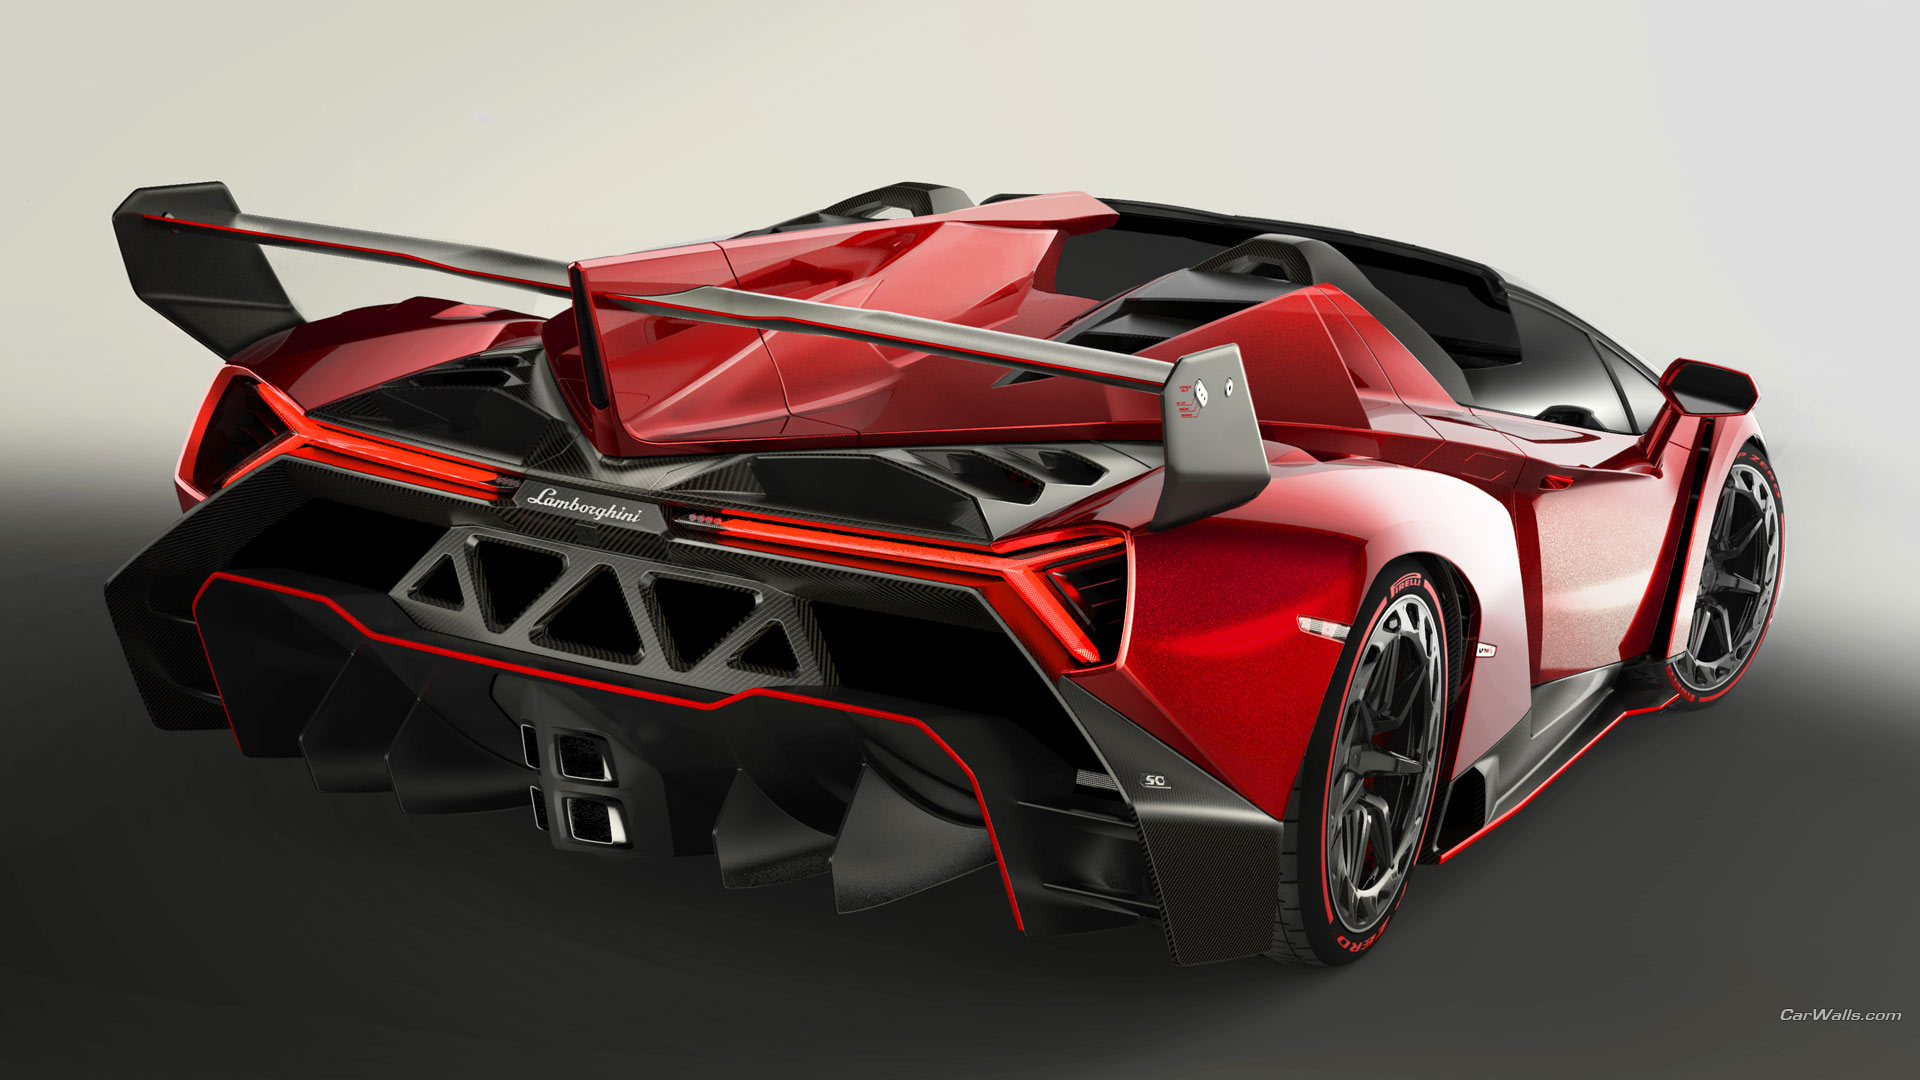 vehicles lamborghini veneno roadster wallpaper - Lamborghini Veneno Roadster Iphone Wallpaper